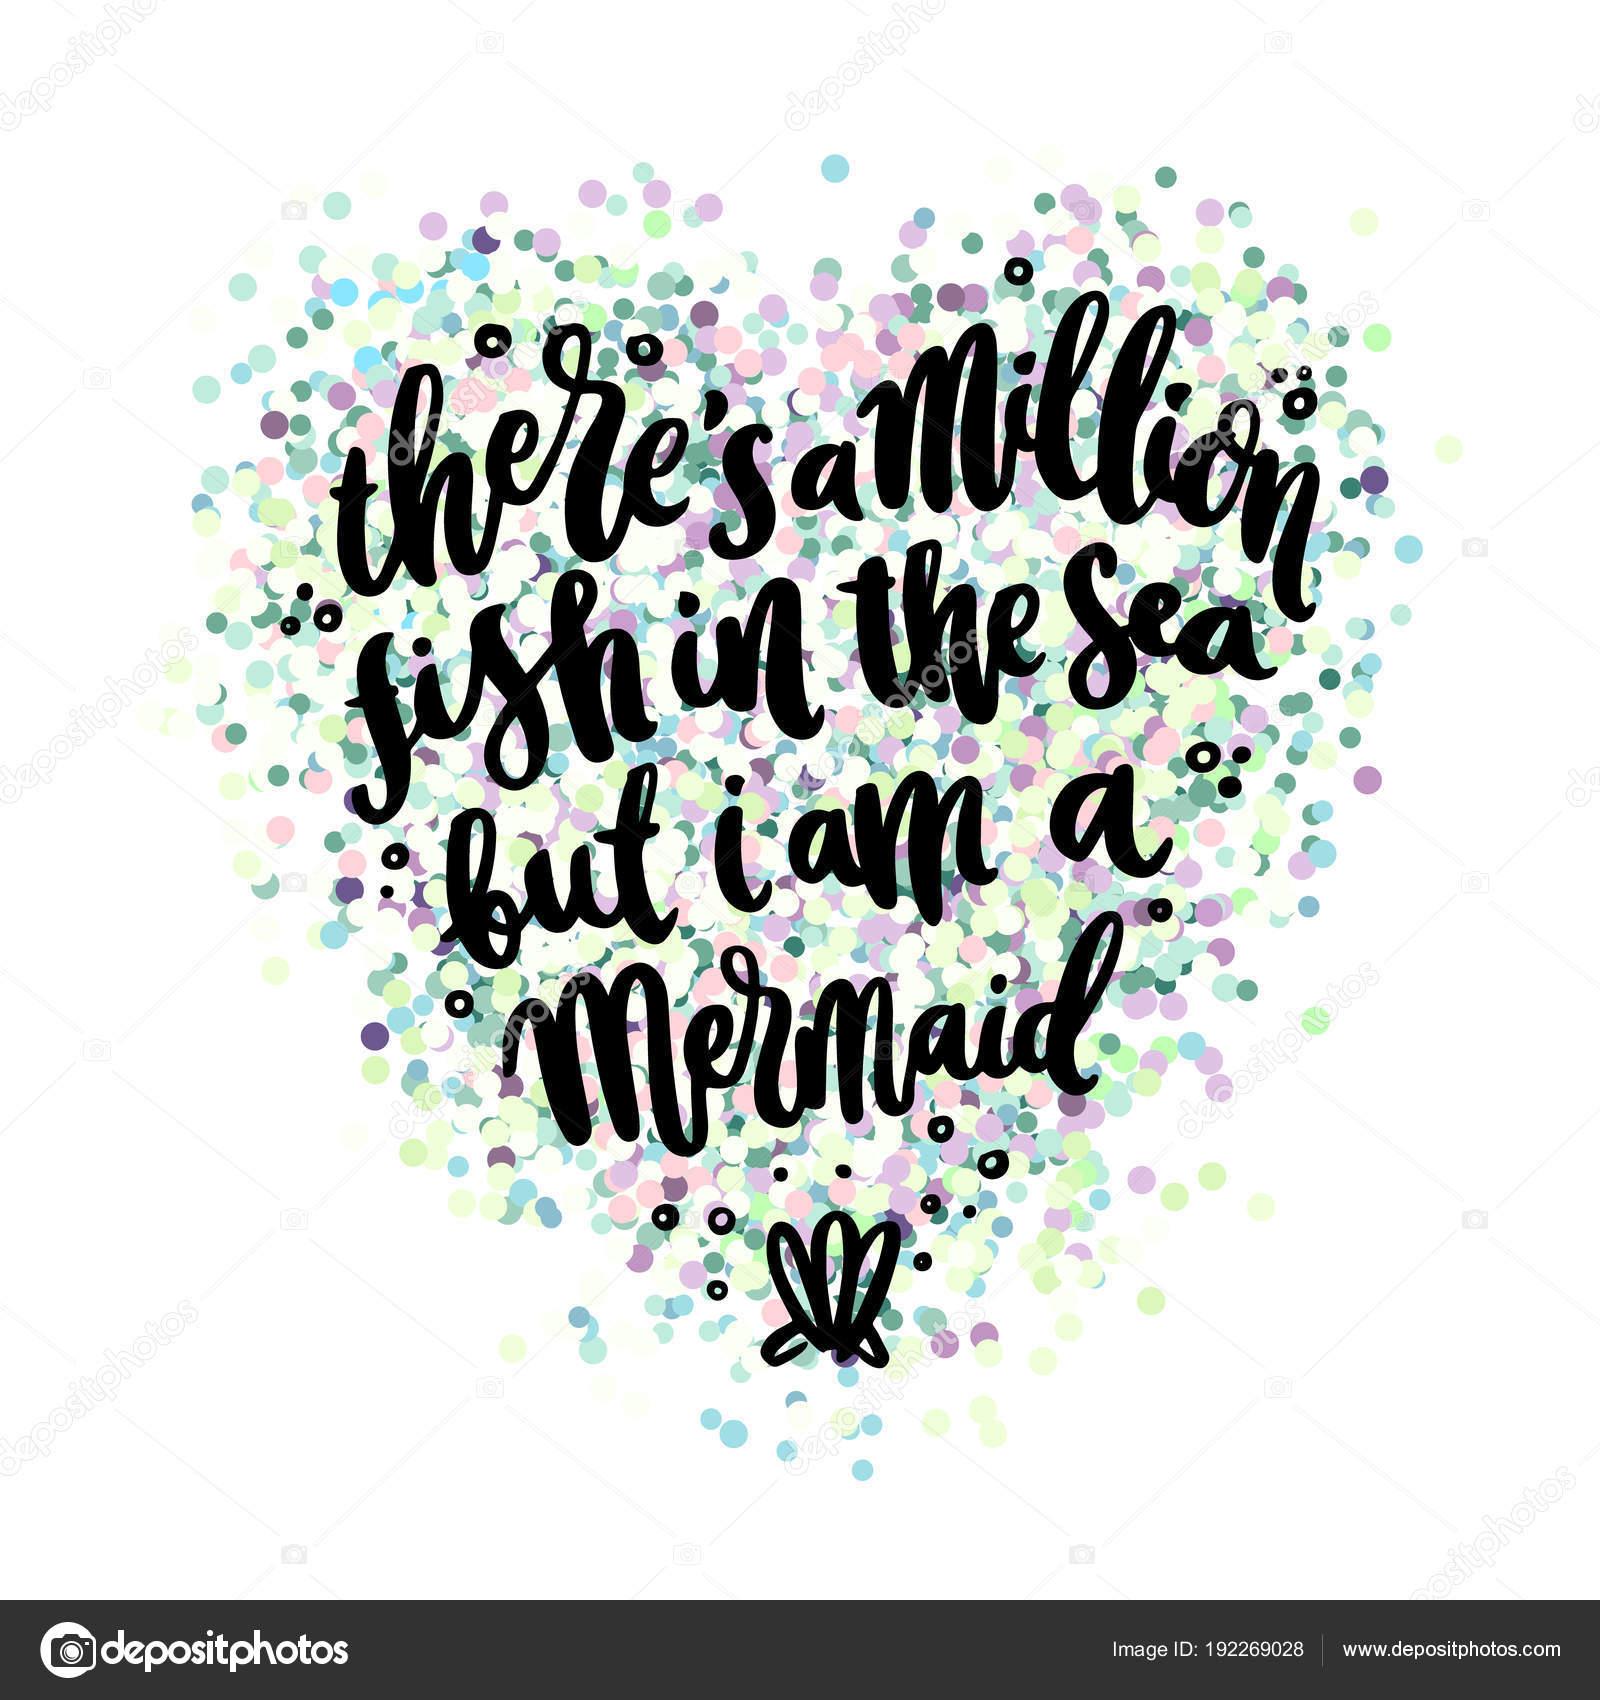 Frase Letras Dibujadas Mano Hay Millón Pescados Mar Pero Soy